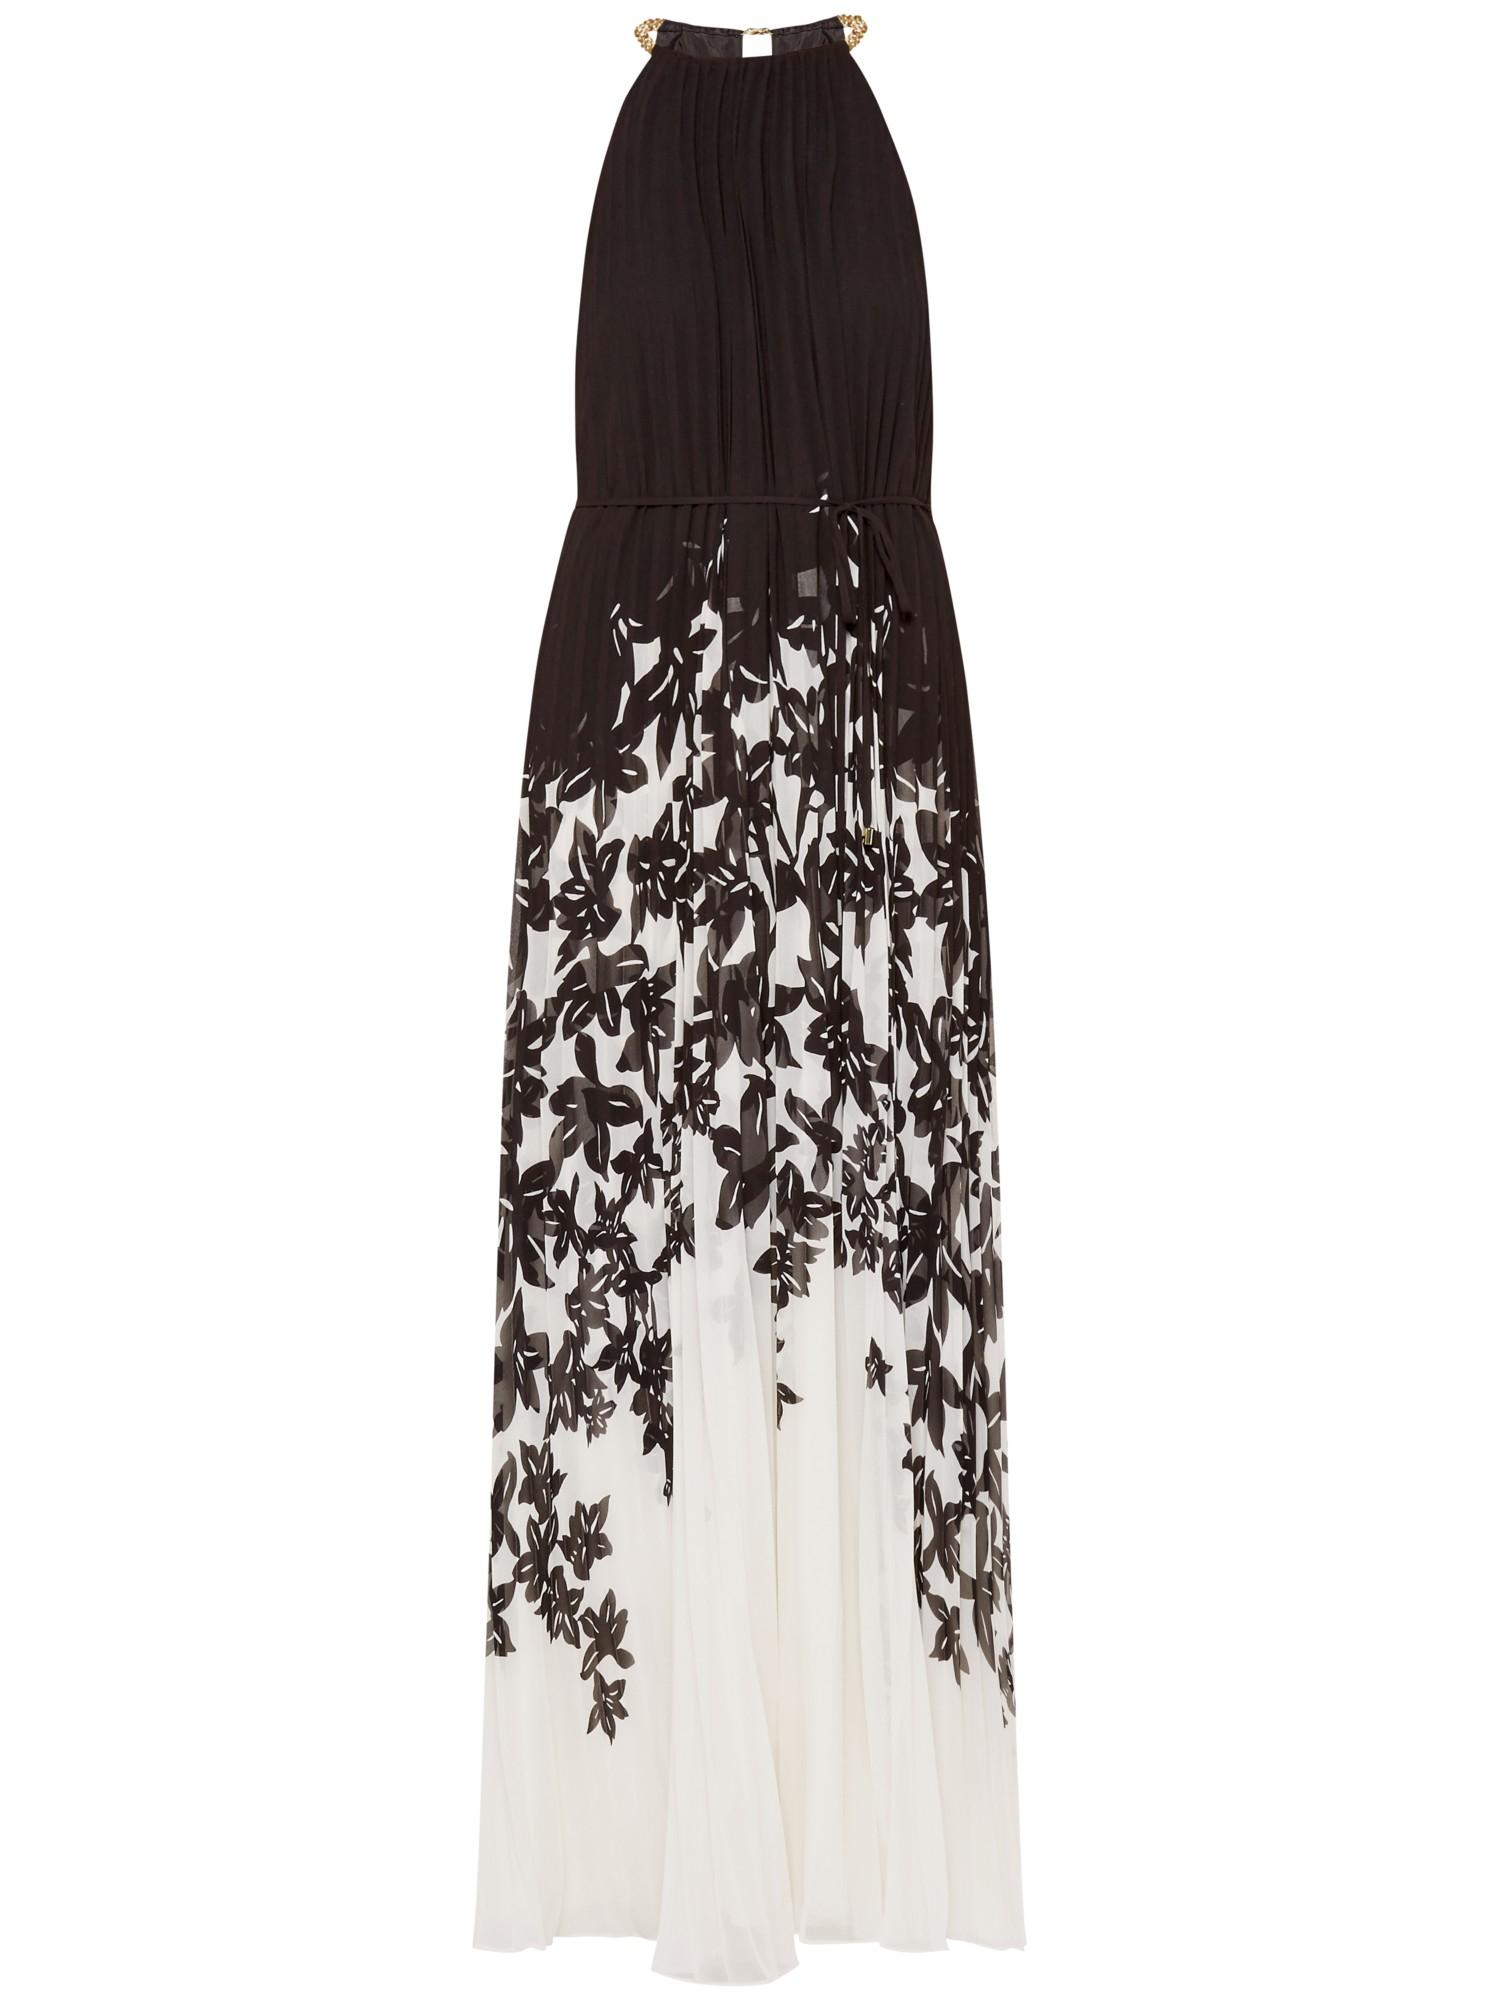 a86729d18 Ted Baker Black And White Flower Dress - Best Image Of Flower ...